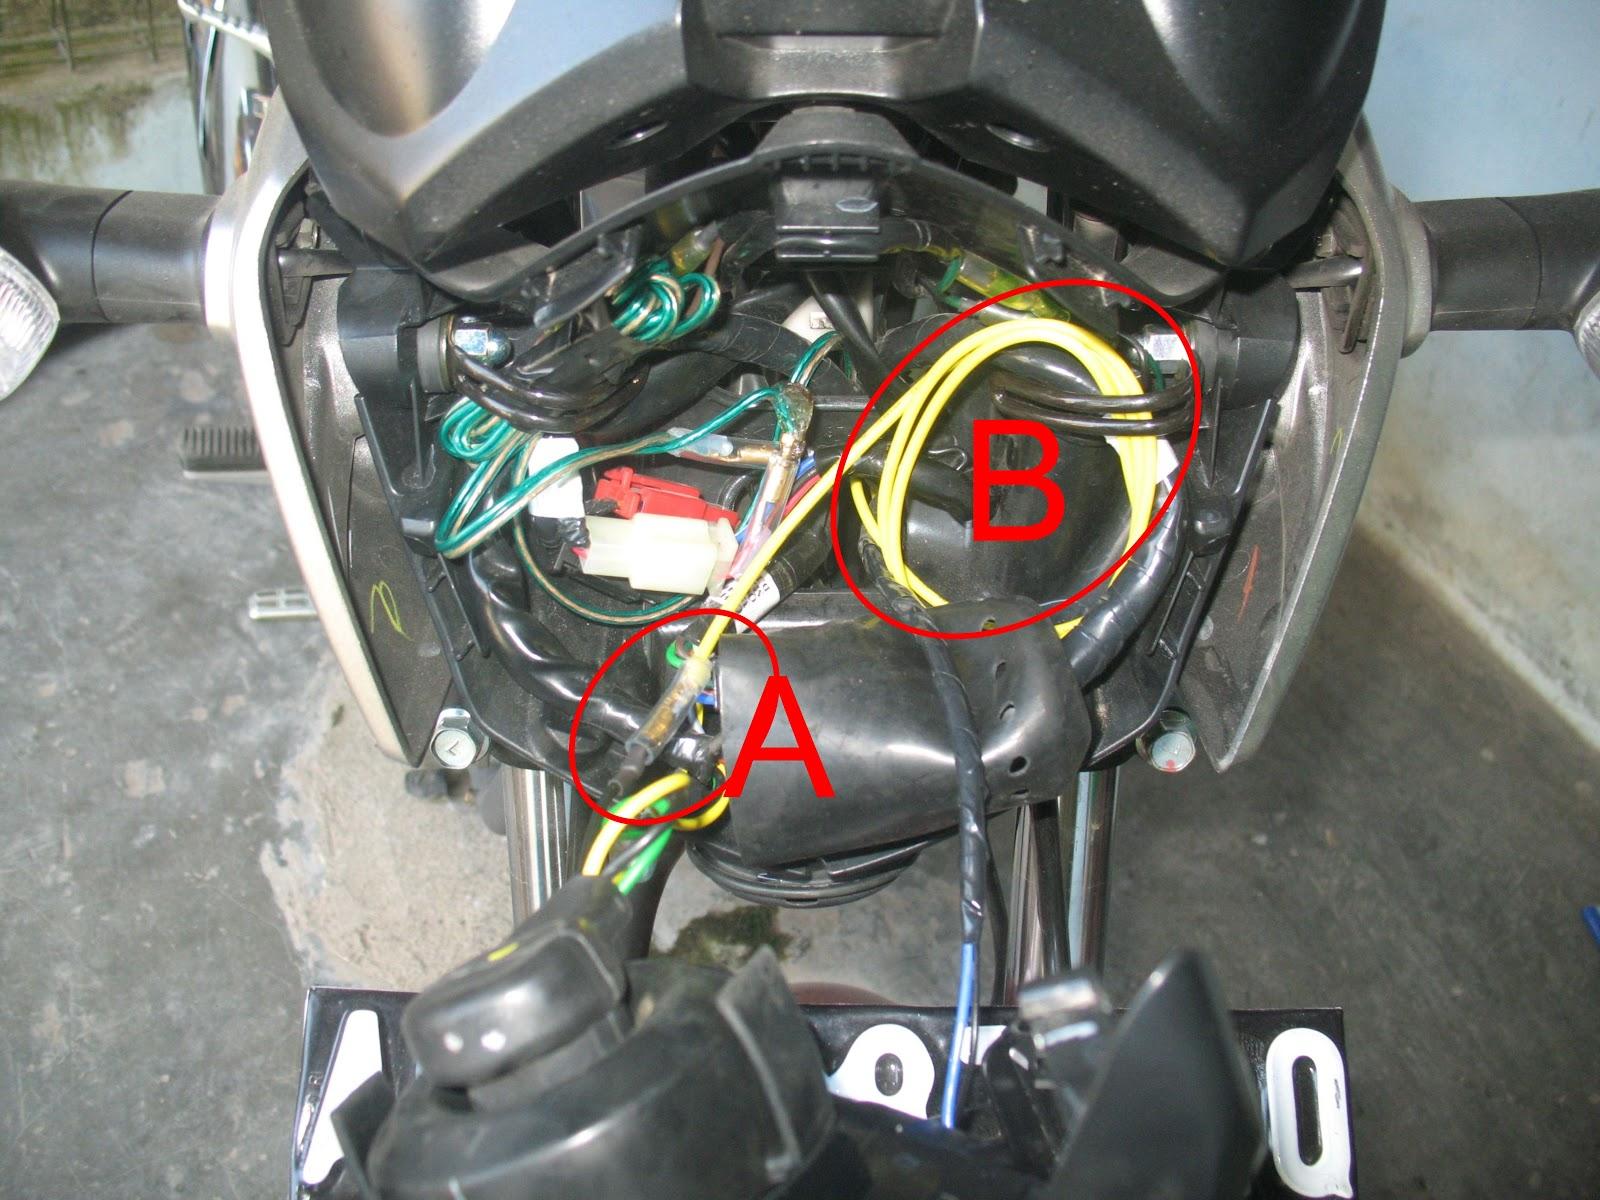 Wiring diagram speedometer old vixion wiring circuit 108 modif speedometer vixion lama modifikasi motor vixion terbaru rh modifikasivixionbaru blogspot com wiring diagram speedo asfbconference2016 Choice Image